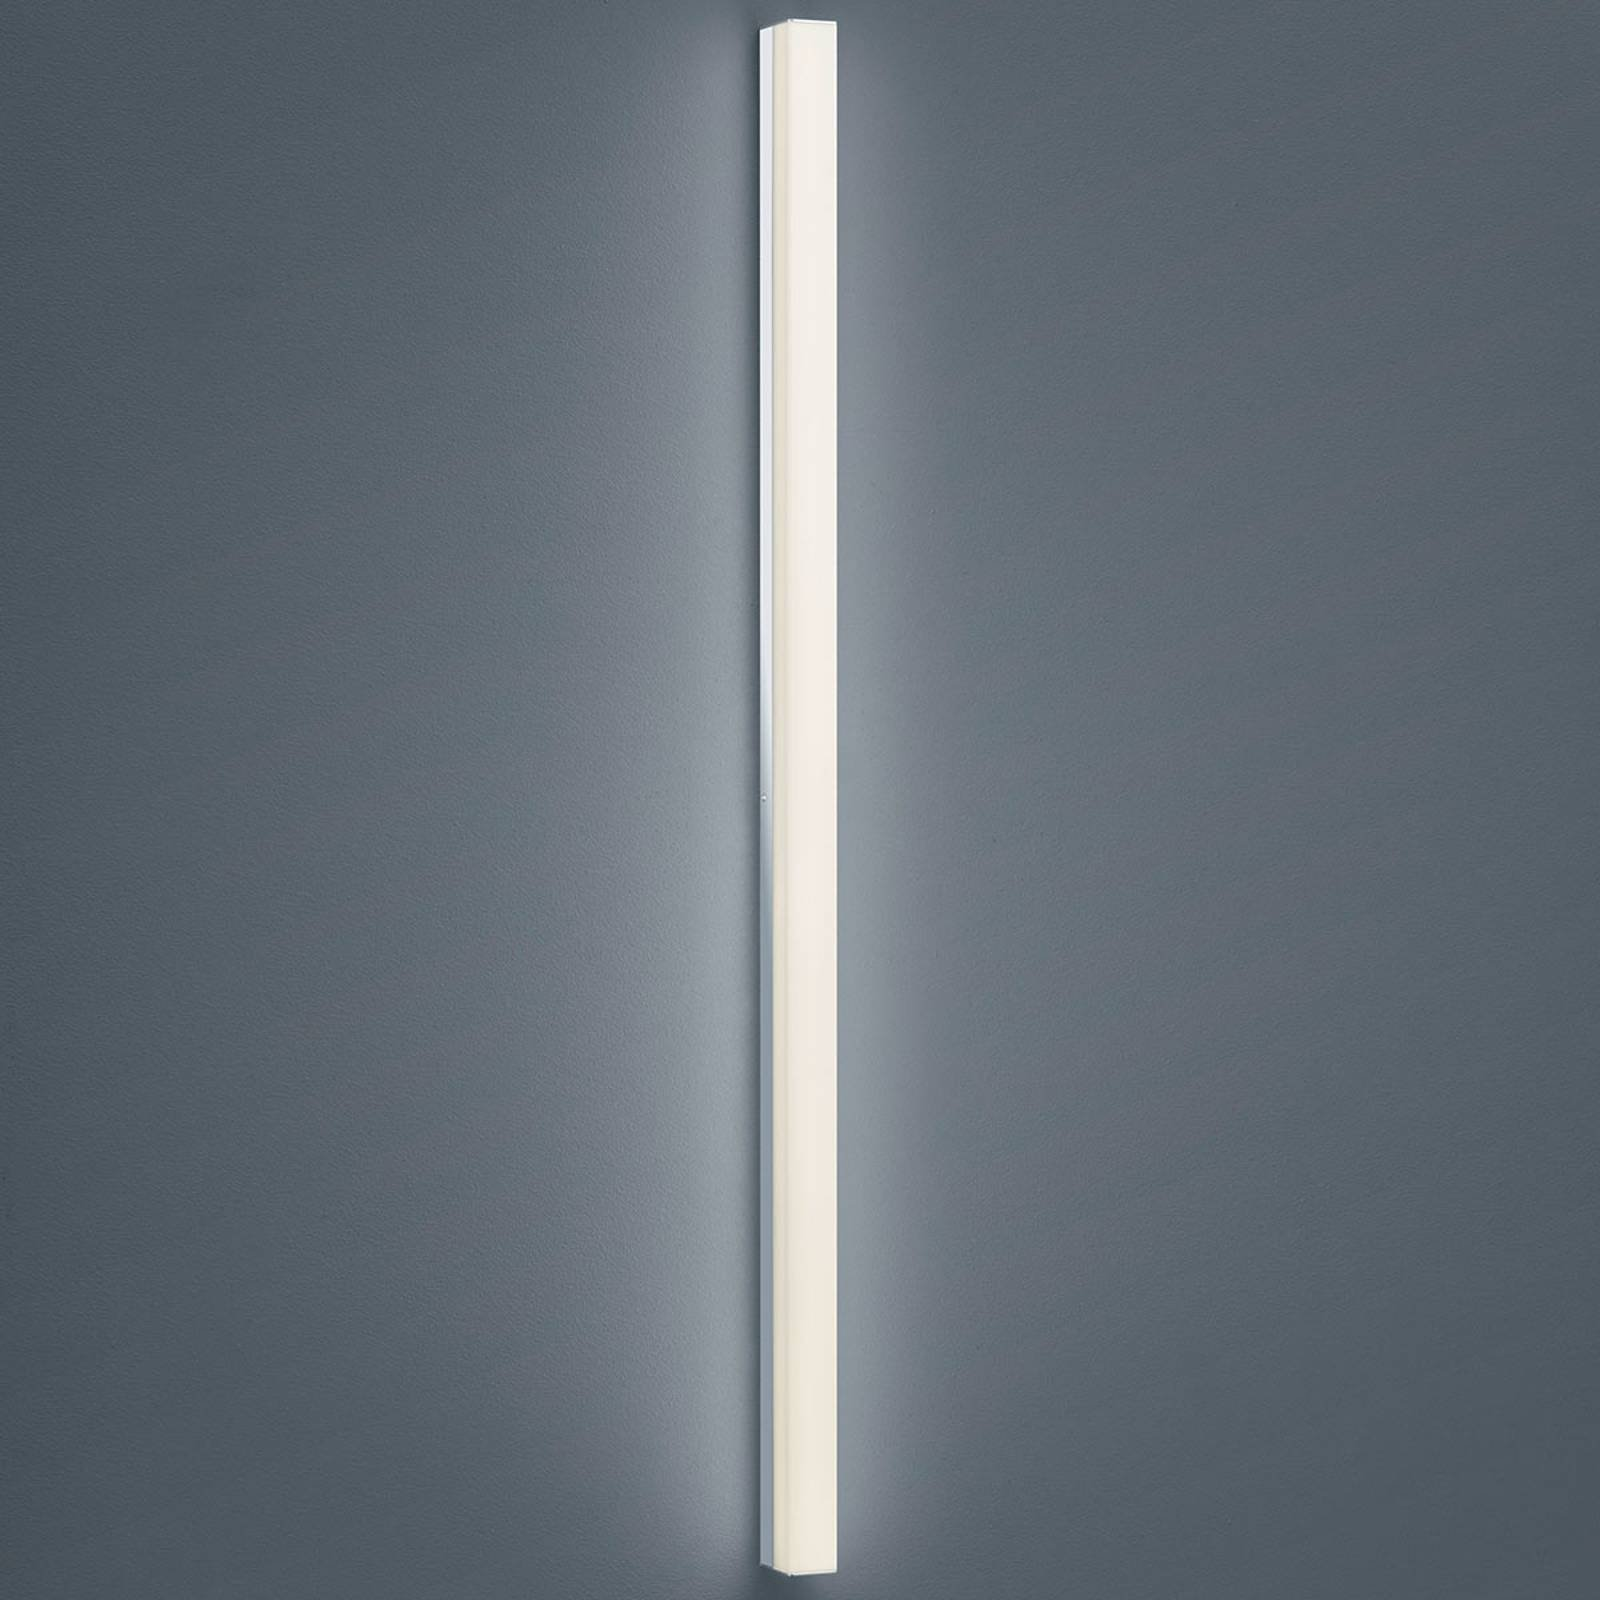 Helestra Lado – LED-speillampe 120 cm